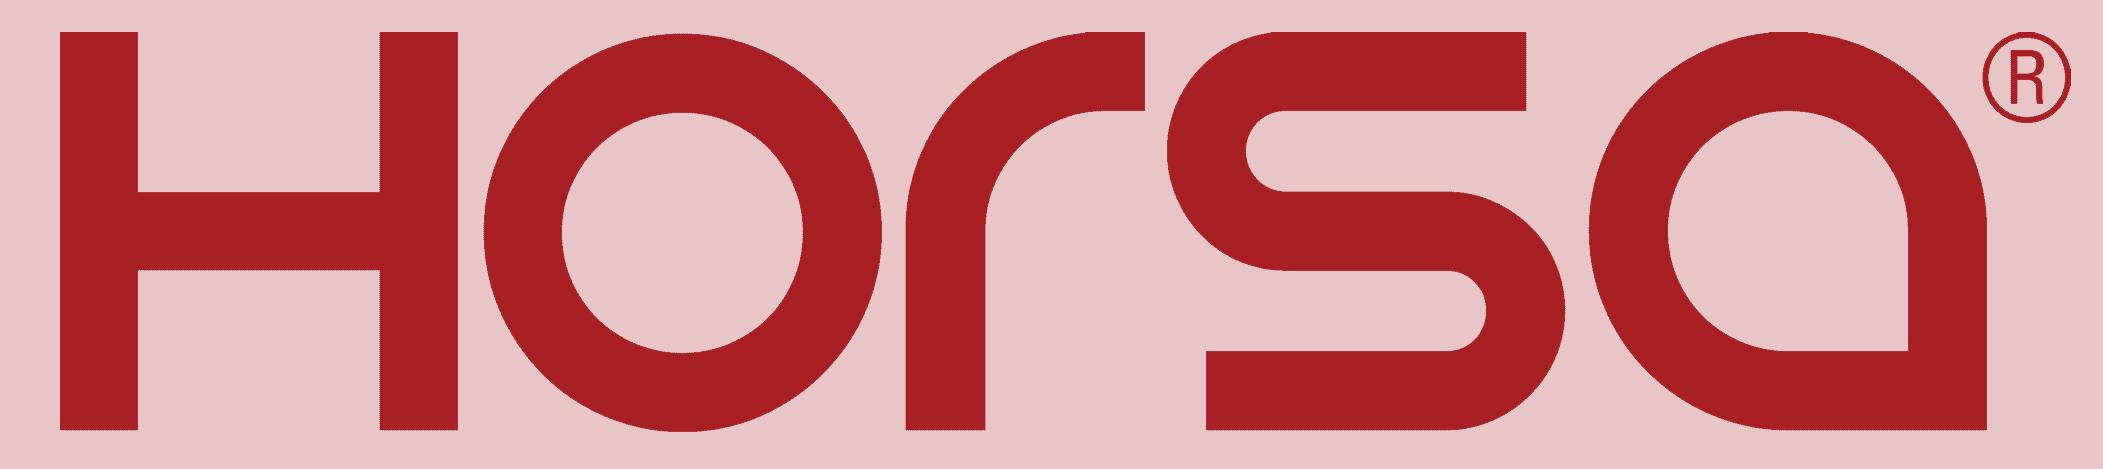 Risultati immagini per horsa logo